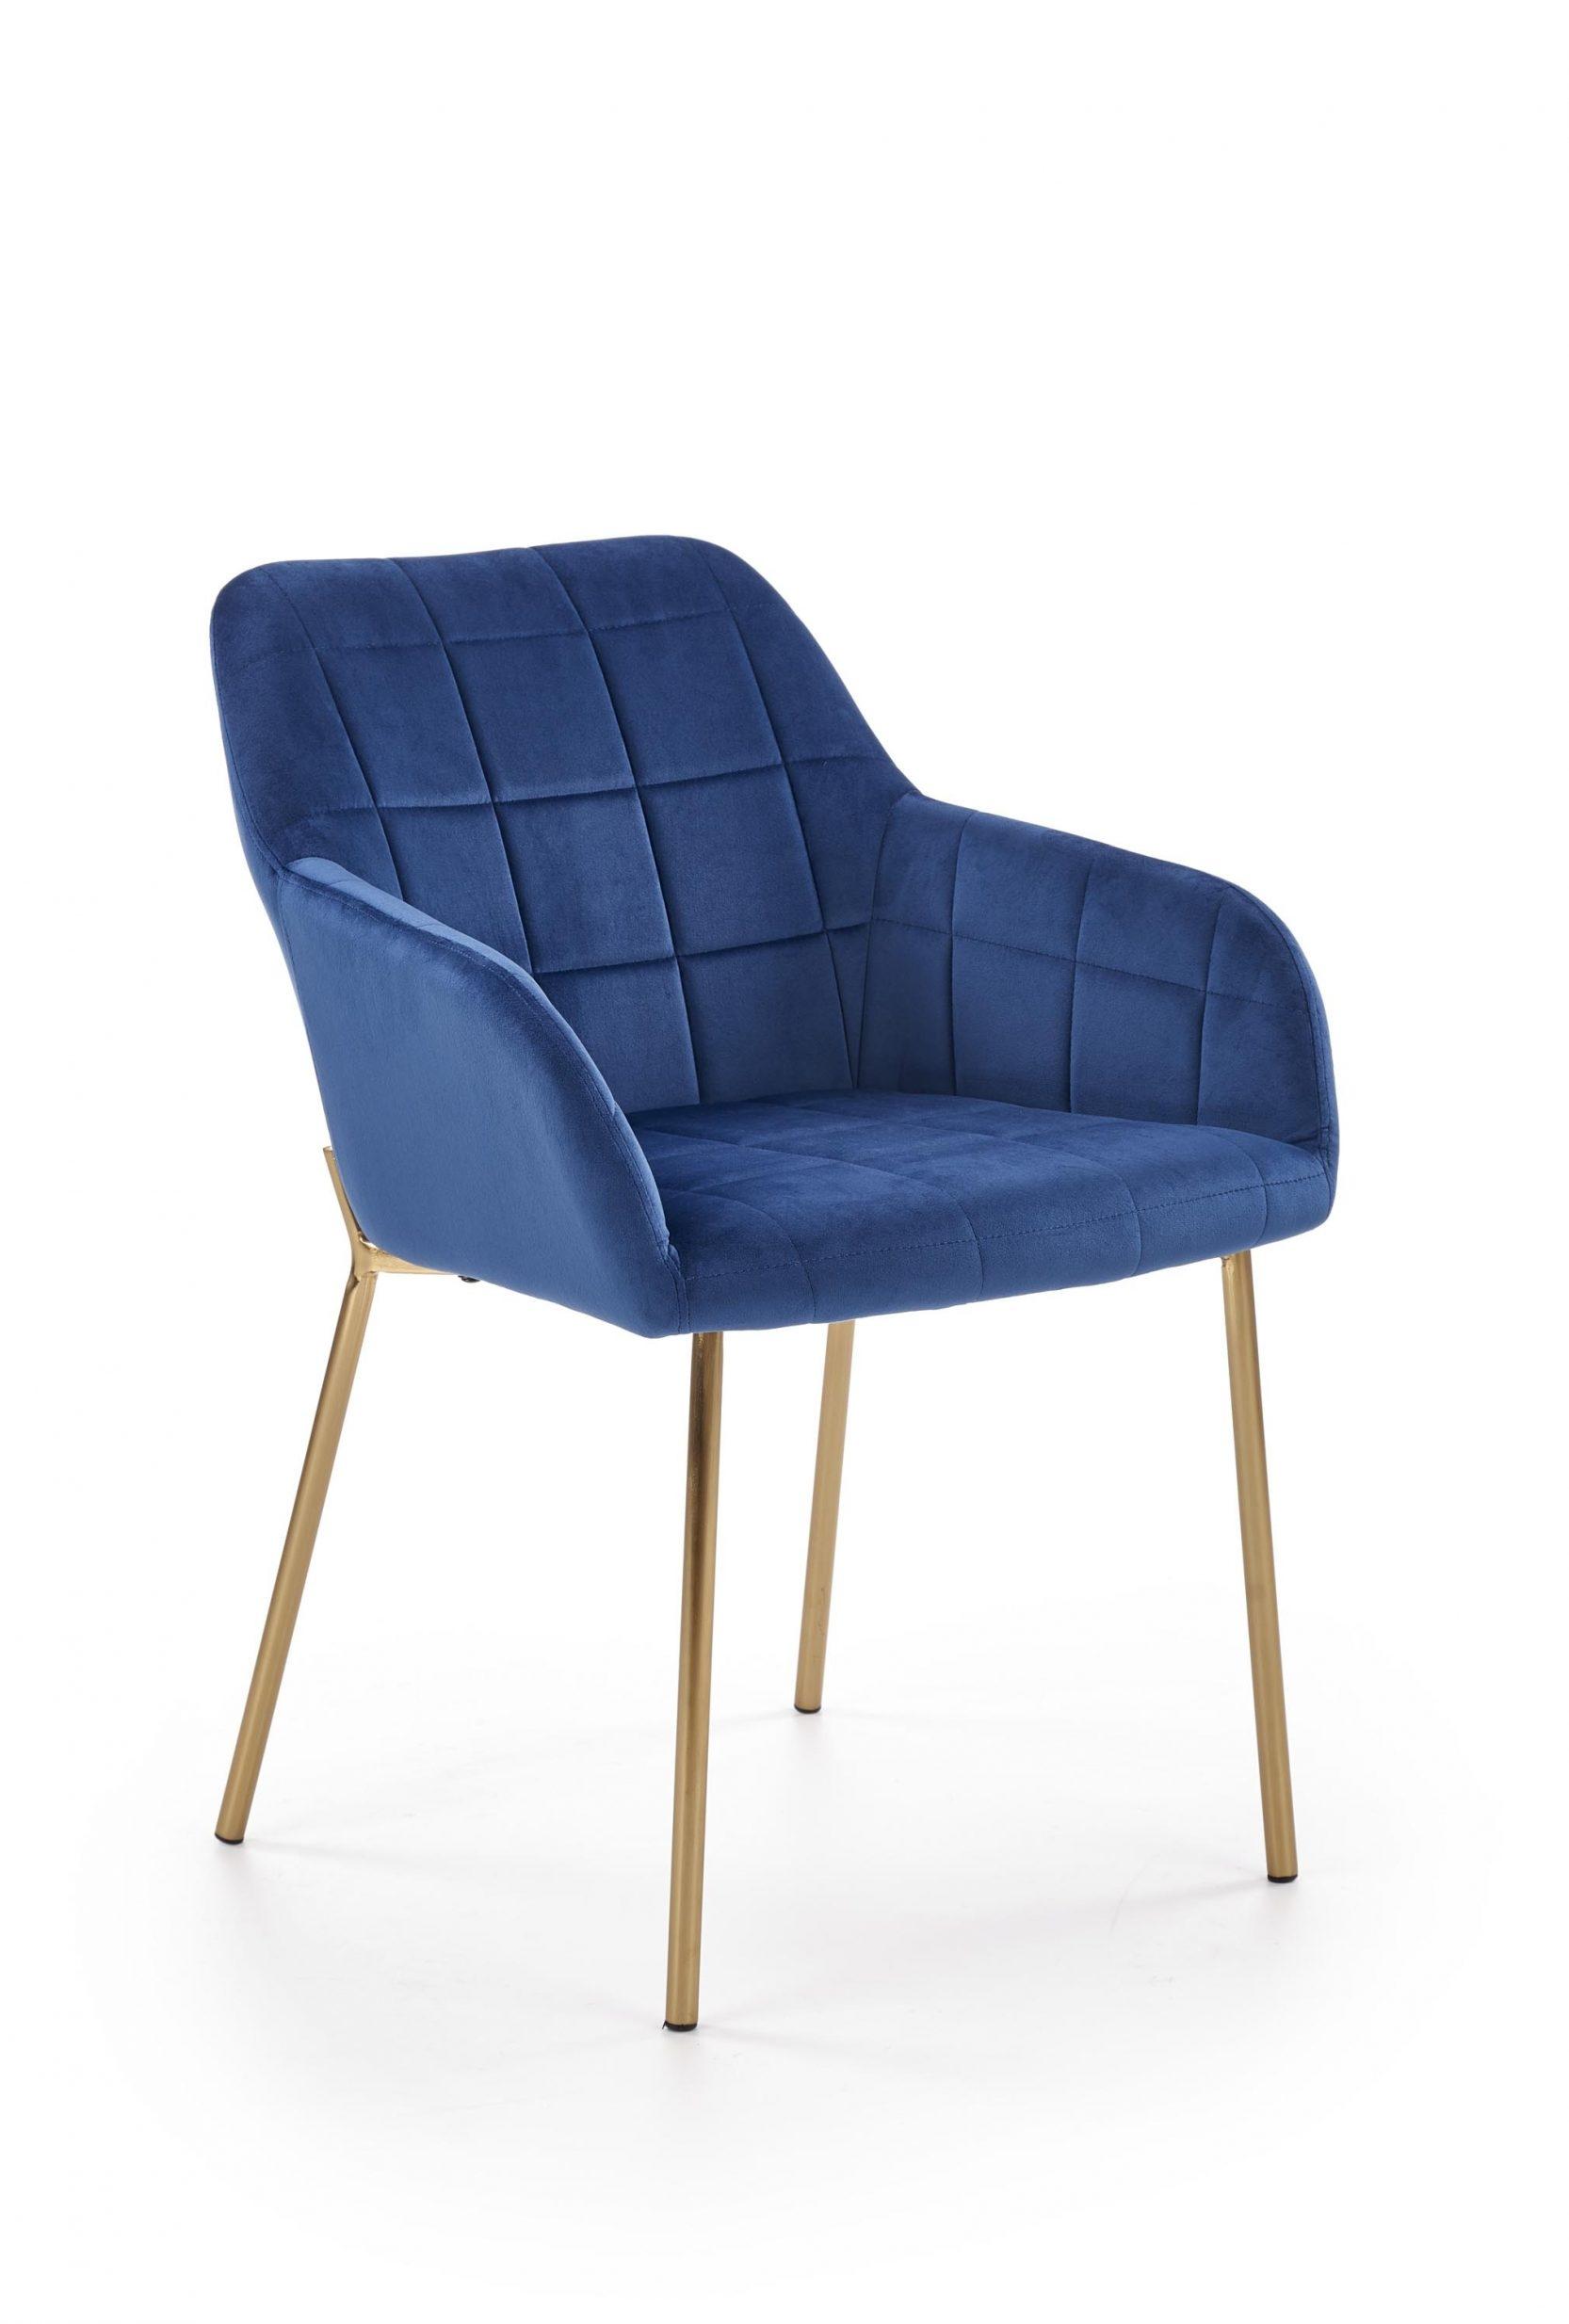 Scaun tapitat cu stofa, cu picioare metalice K306 Albastru inchis / Auriu, l58xA57xH80 cm